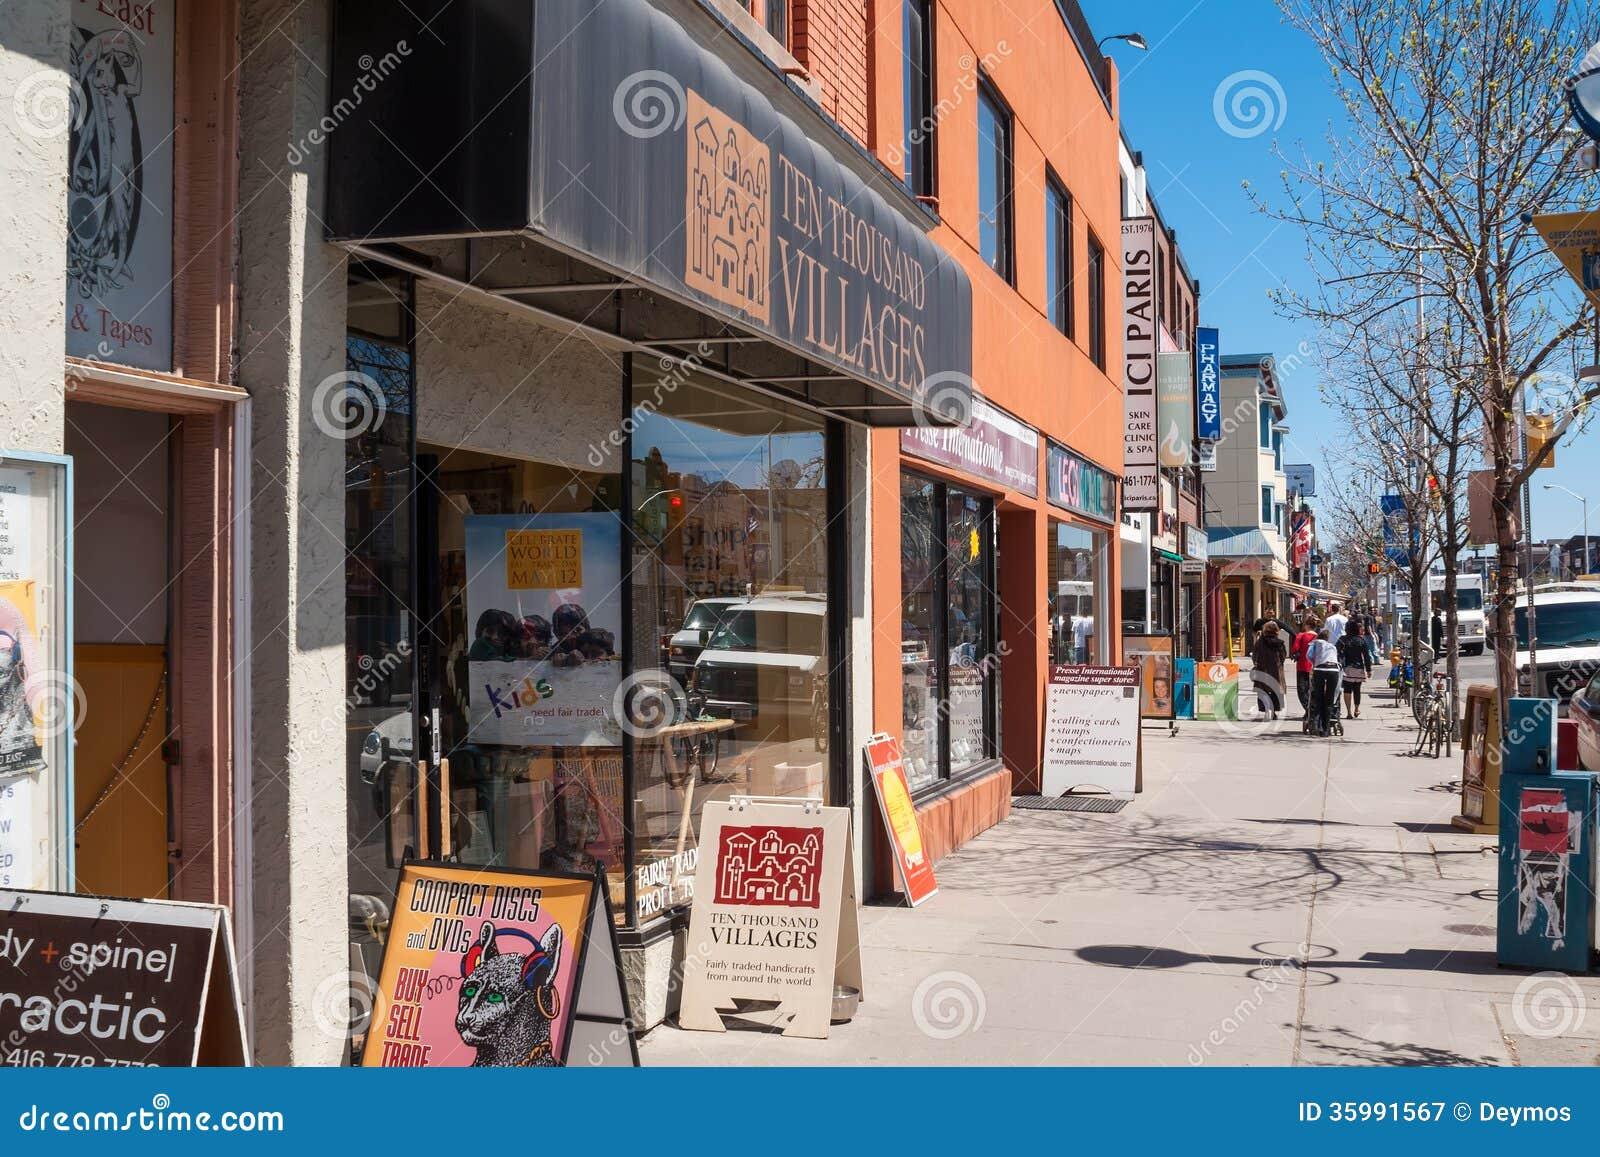 Photography shops stockport